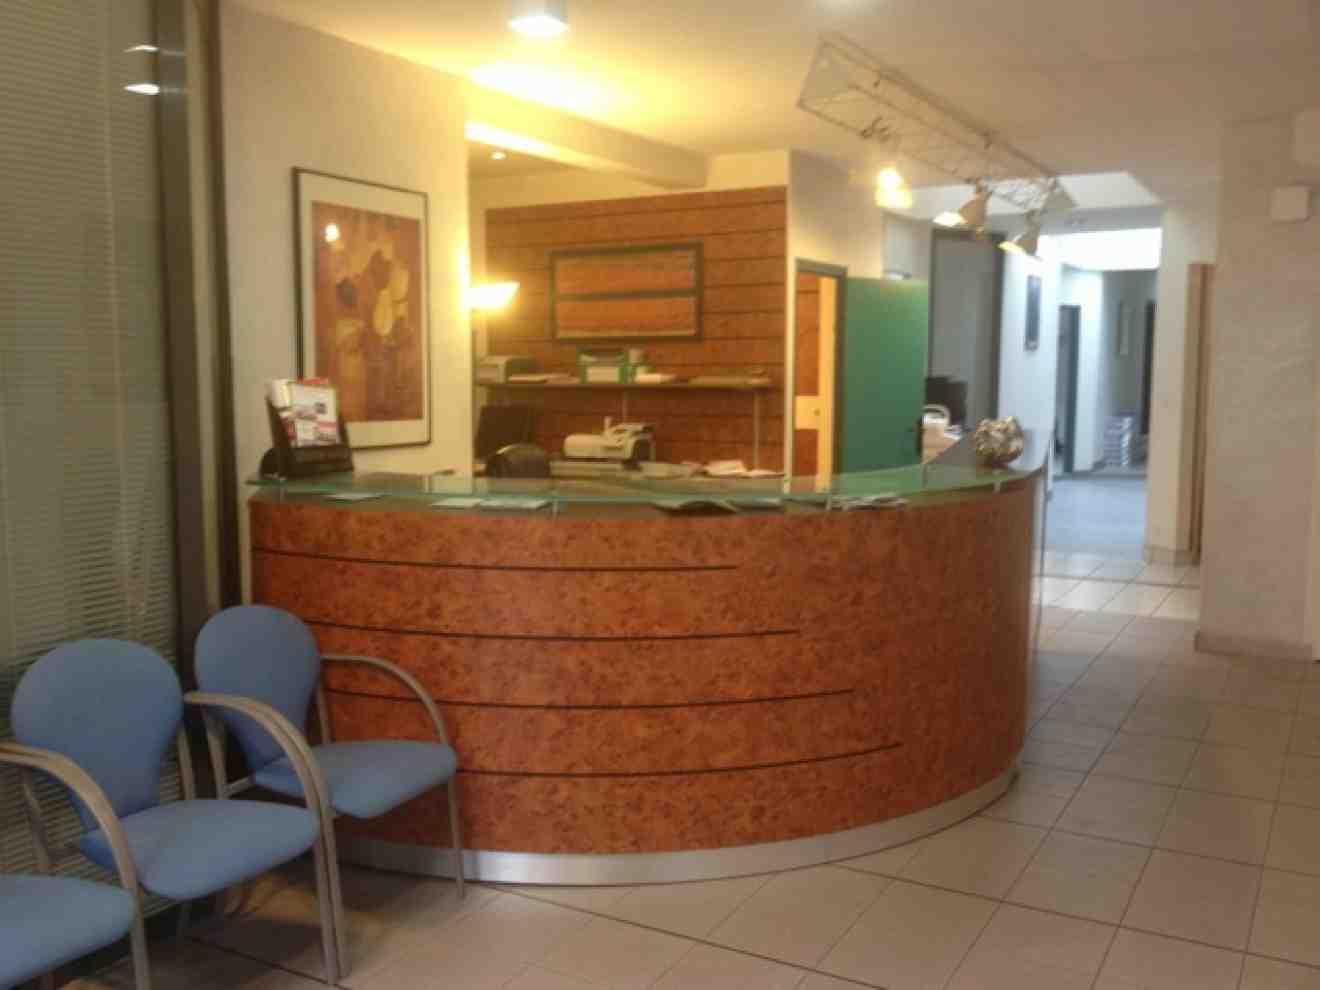 Photo Centre d'Affaires Solférino, accueil.